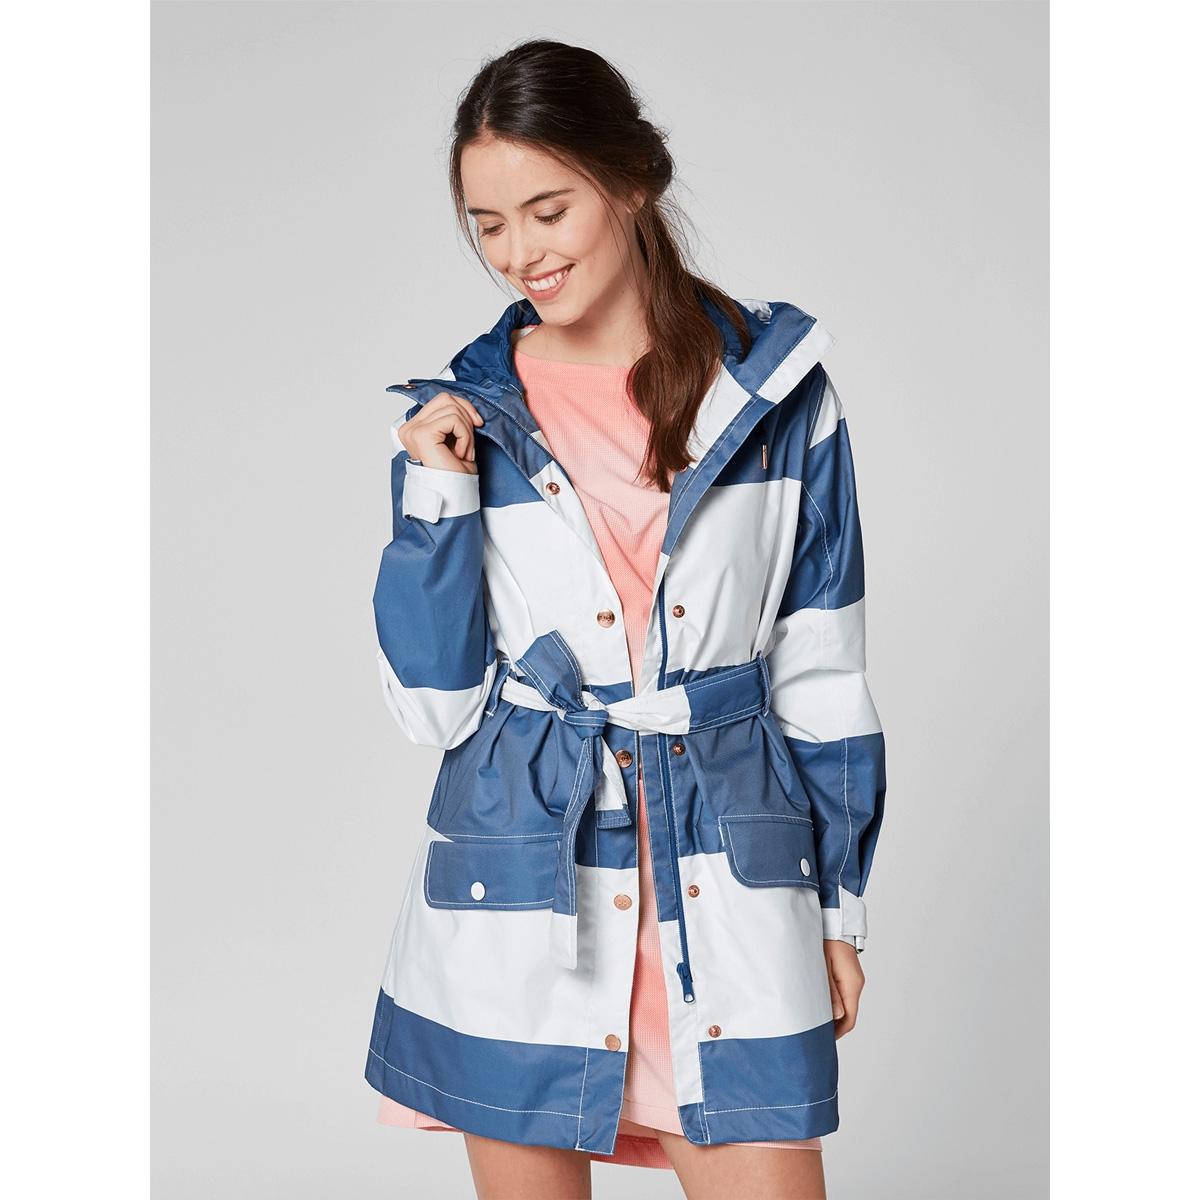 bf138736 ... Image of Helly Hansen W Lyness Coat (Women's) - Marine Blue ...